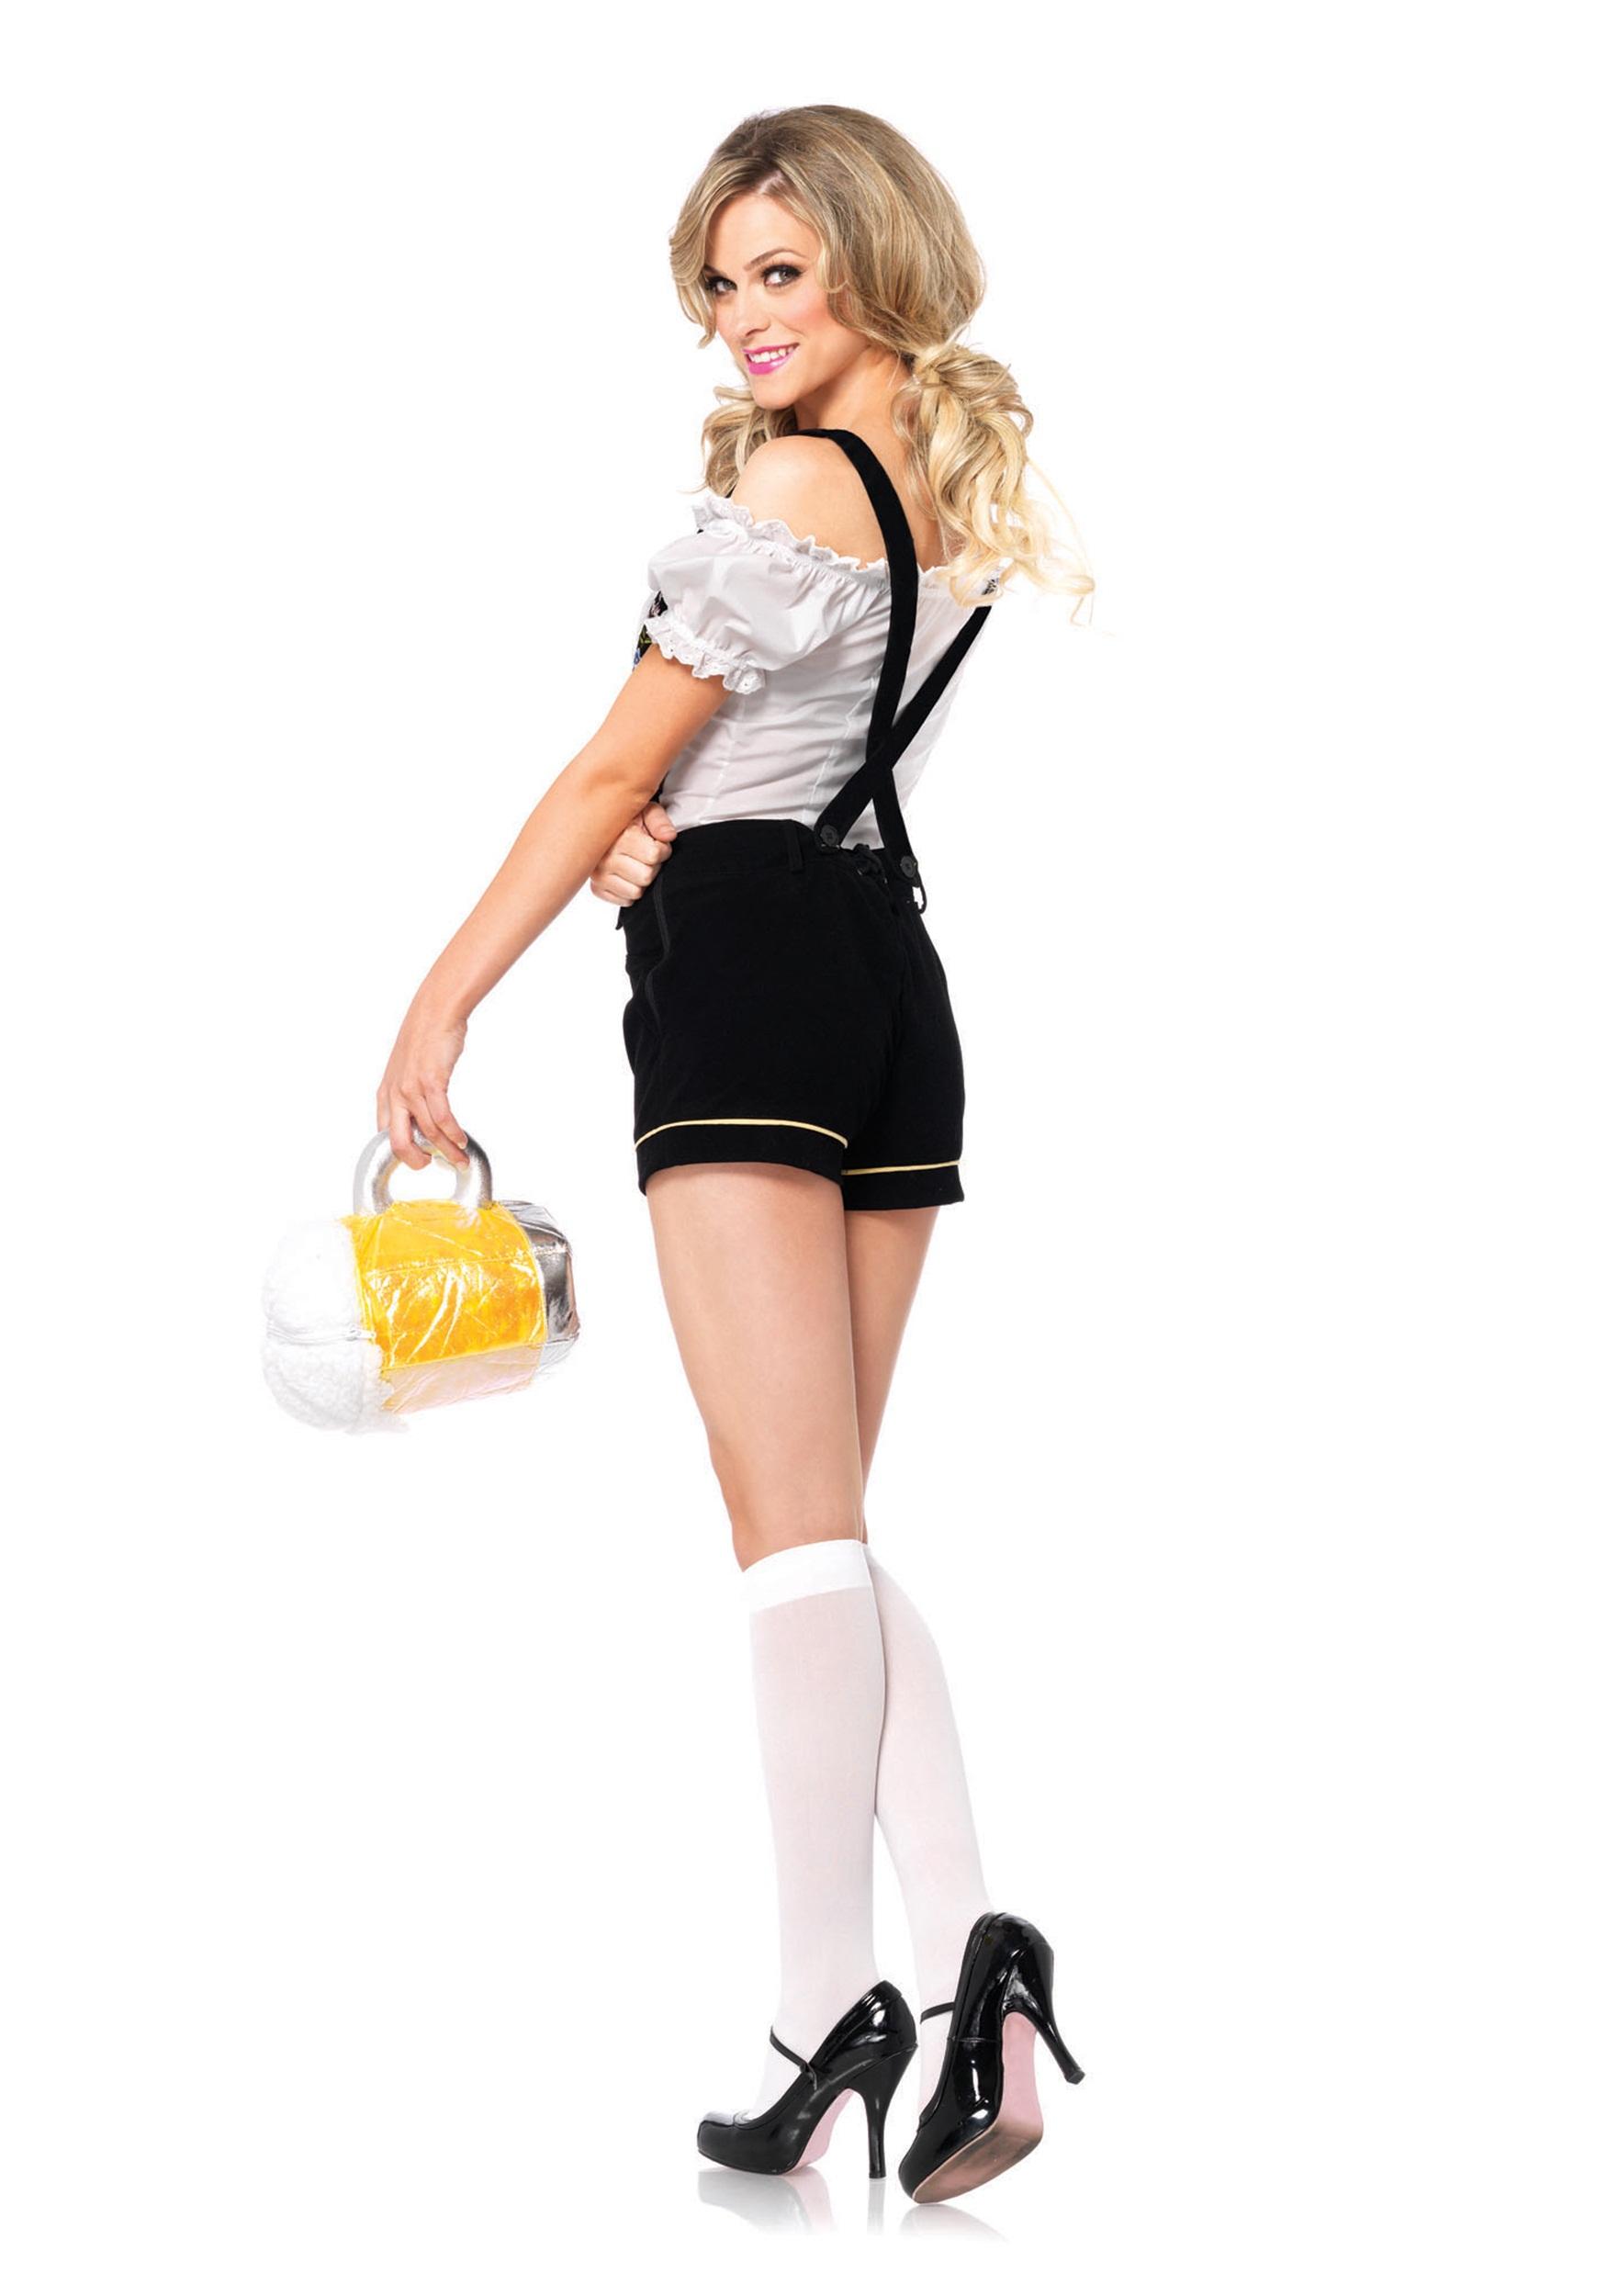 Edelweiss Lederhosen Adult Costume Edelweiss Lederhosen Adult Costume alt  sc 1 st  Halloween Costumes & Edelweiss Lederhosen Adult Costume